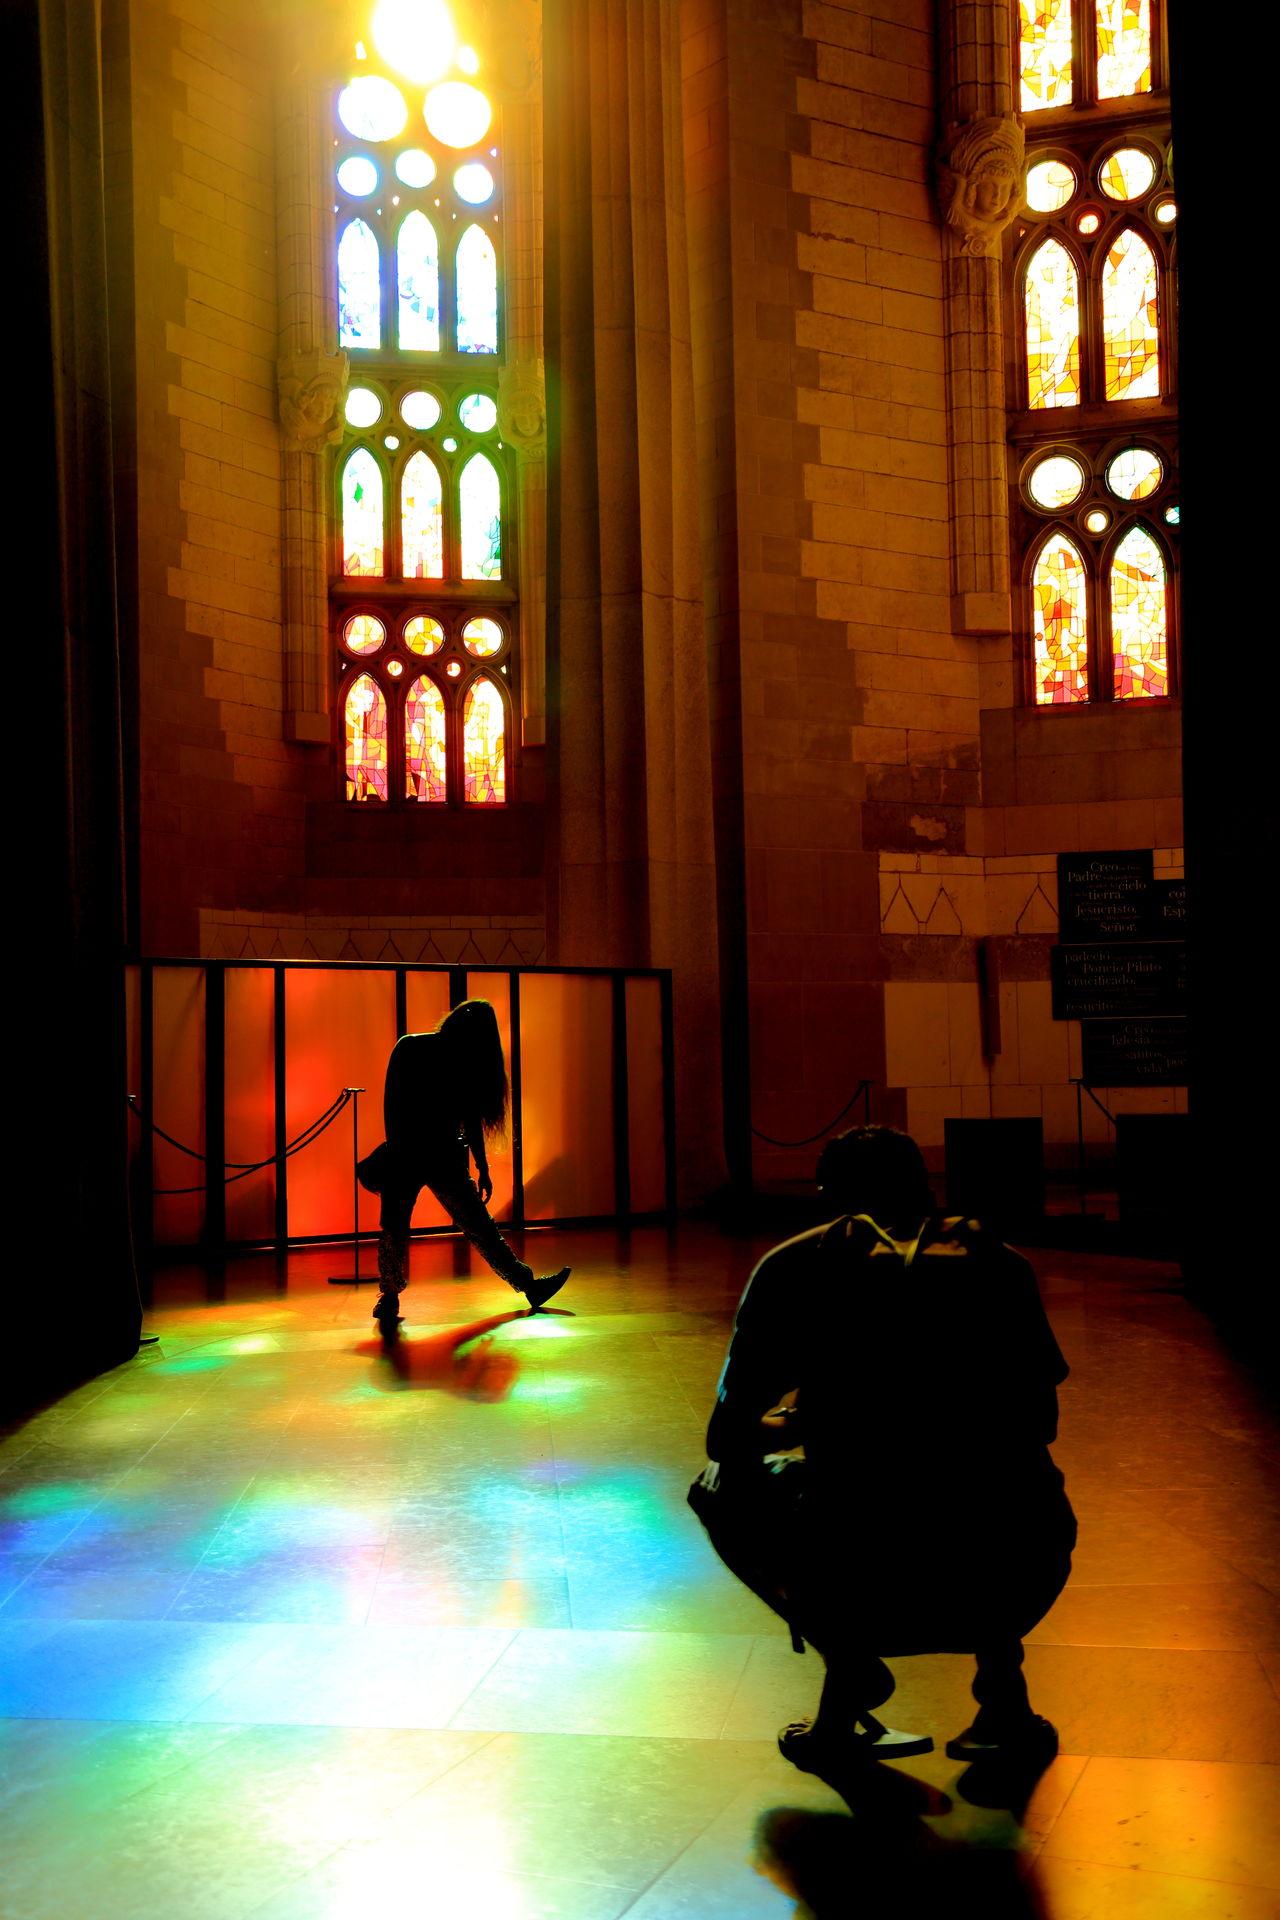 Dark Illuminated Lifestyles Rainbow Colors Sagrada Familia Shadows Shadows & Lights Take Picture